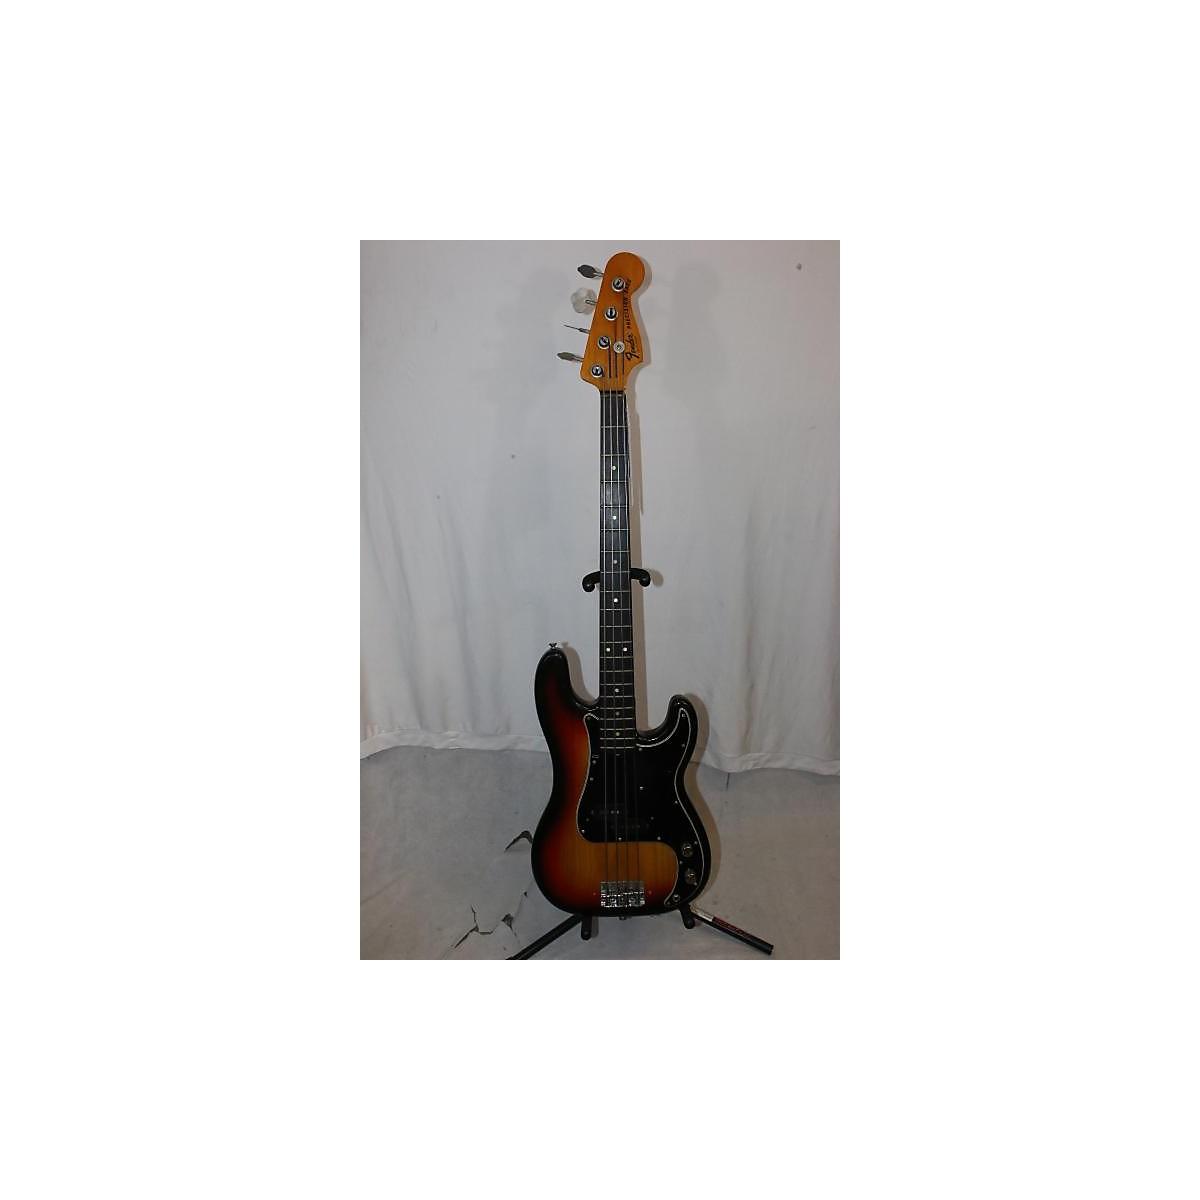 Fender 1976 1976 Fender Precision Bass Sunburst OHSC Electric Bass Guitar